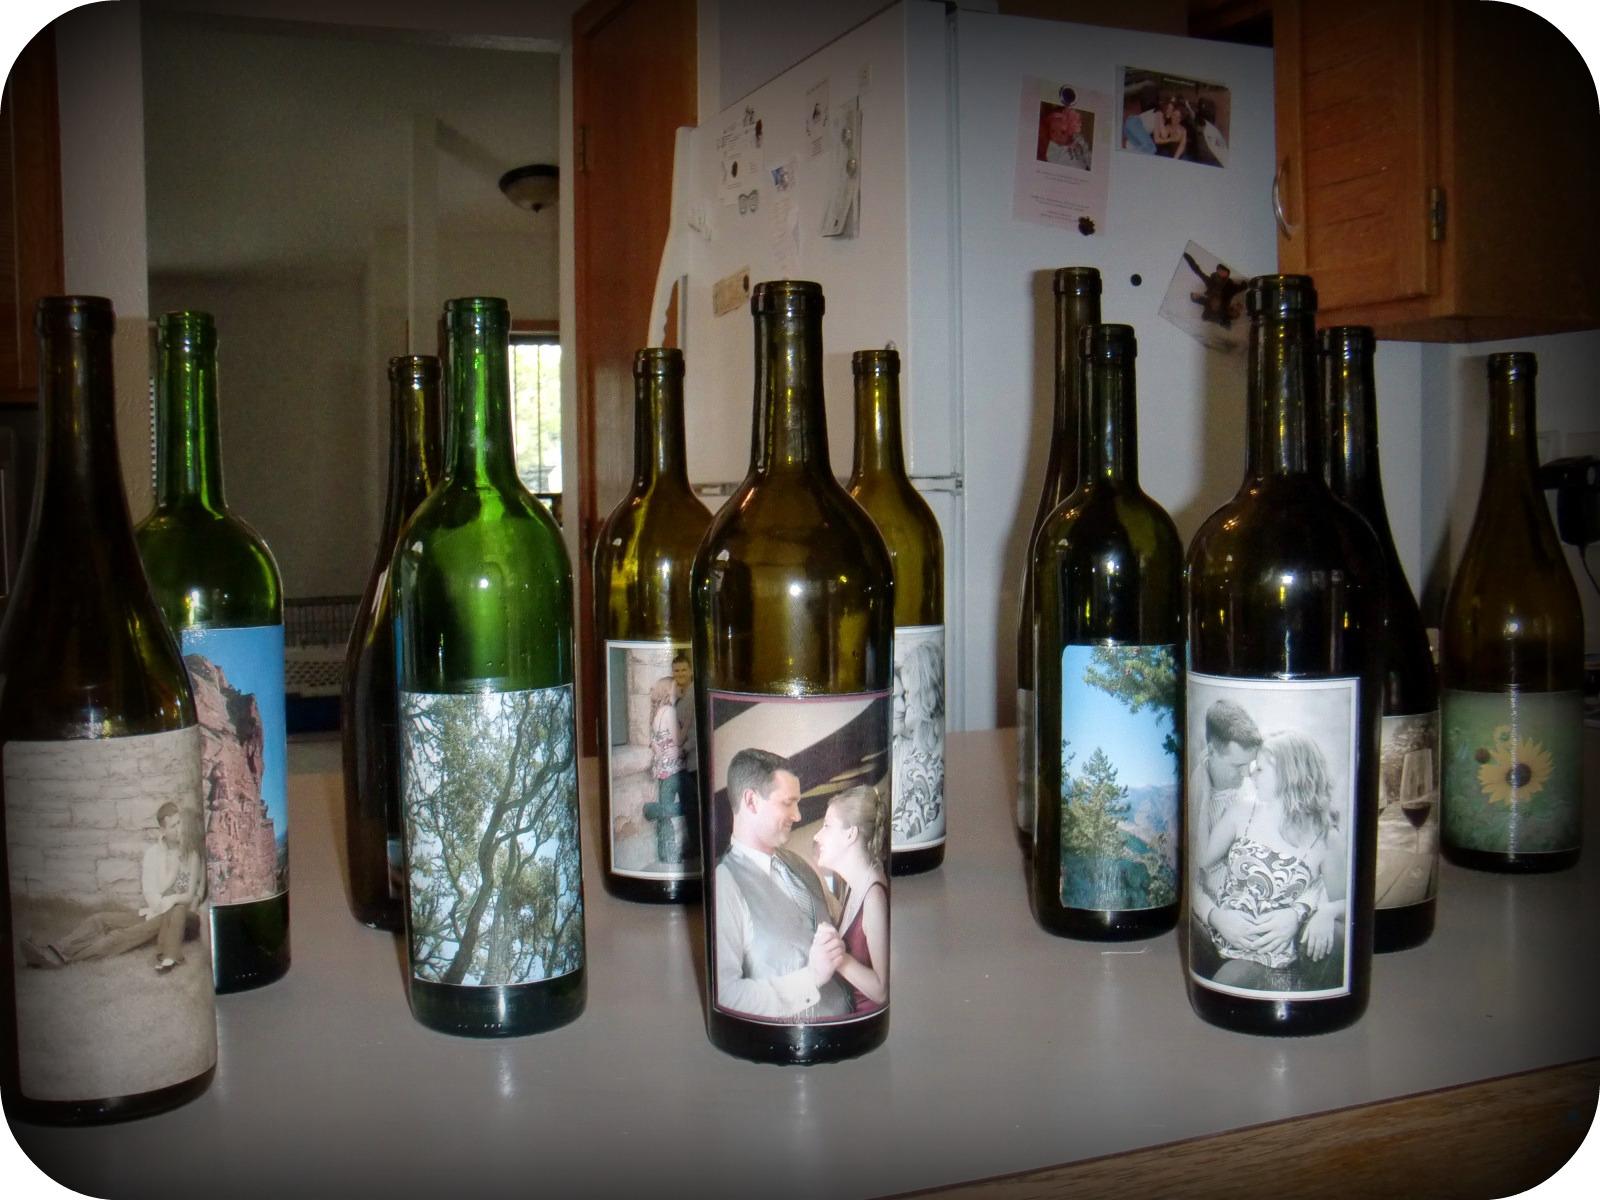 frugal with a flourish reader project wedding centerpiece wine bottles. Black Bedroom Furniture Sets. Home Design Ideas